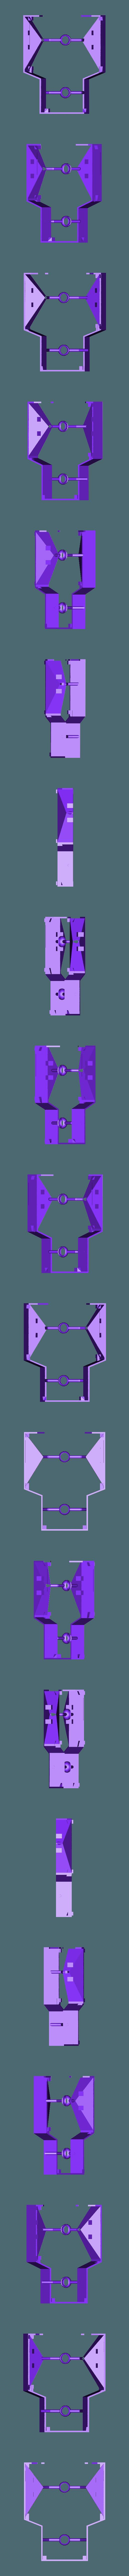 2.stl Download free STL file MARBLE BOY automat • 3D printer object, Janis_Bruchwalski